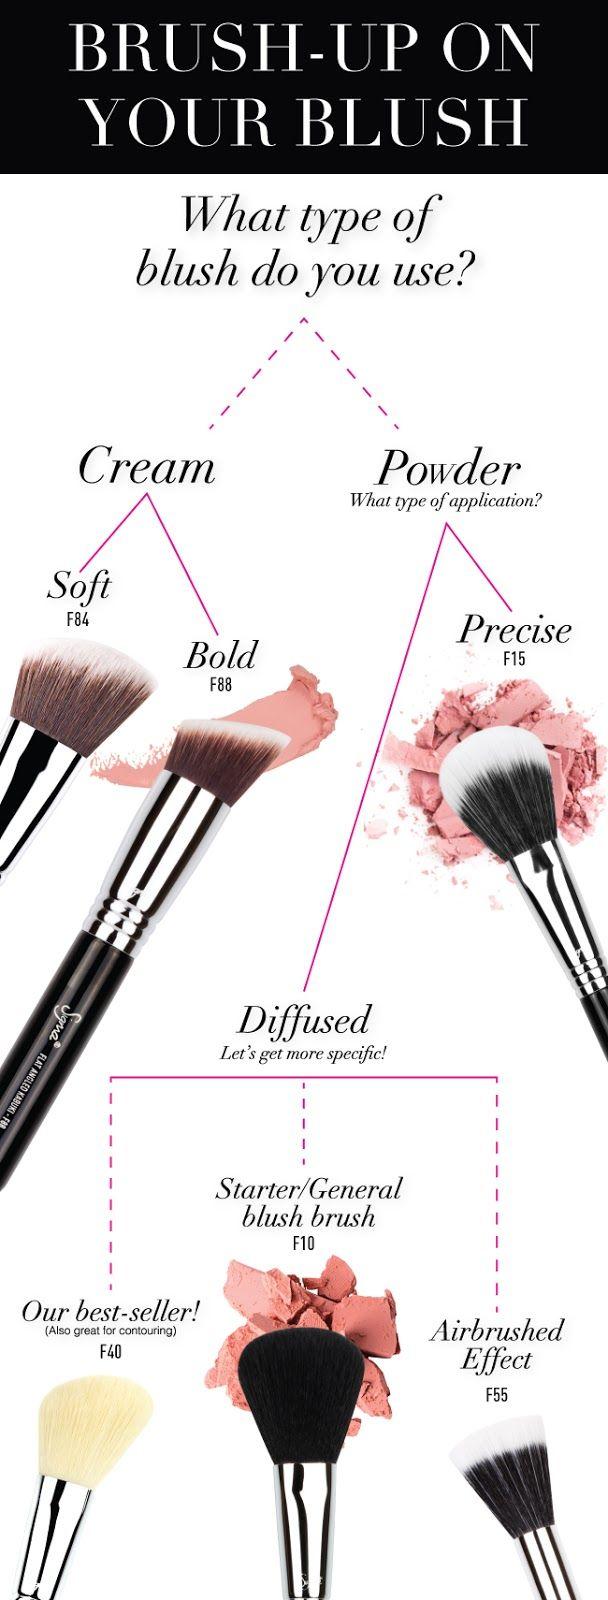 Find Your Best Sigma Blush Brush!